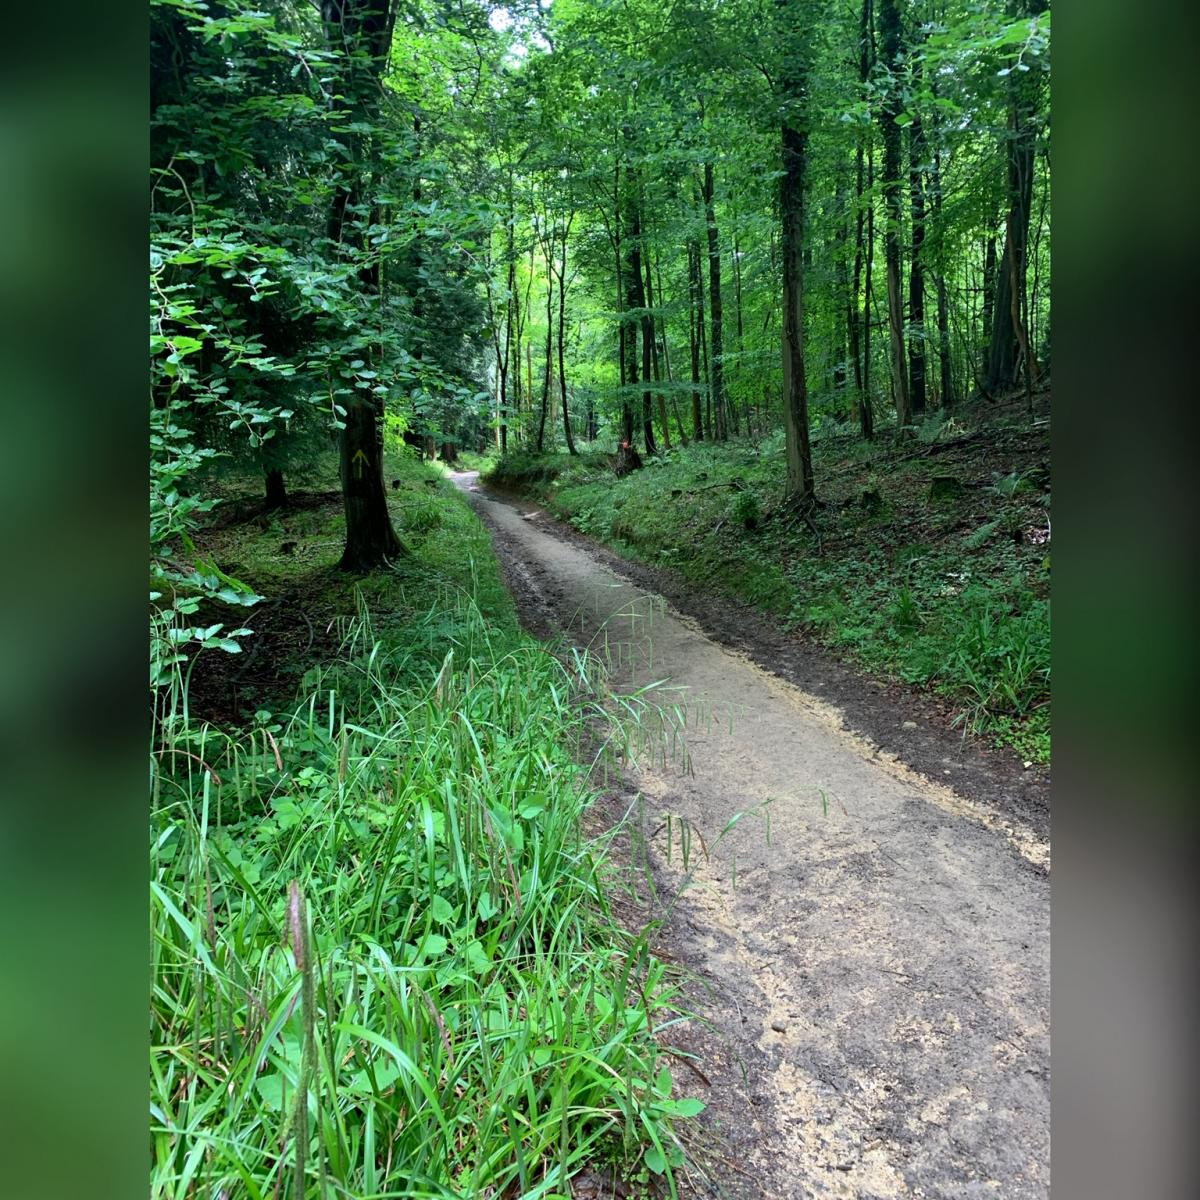 A muddy forest trail